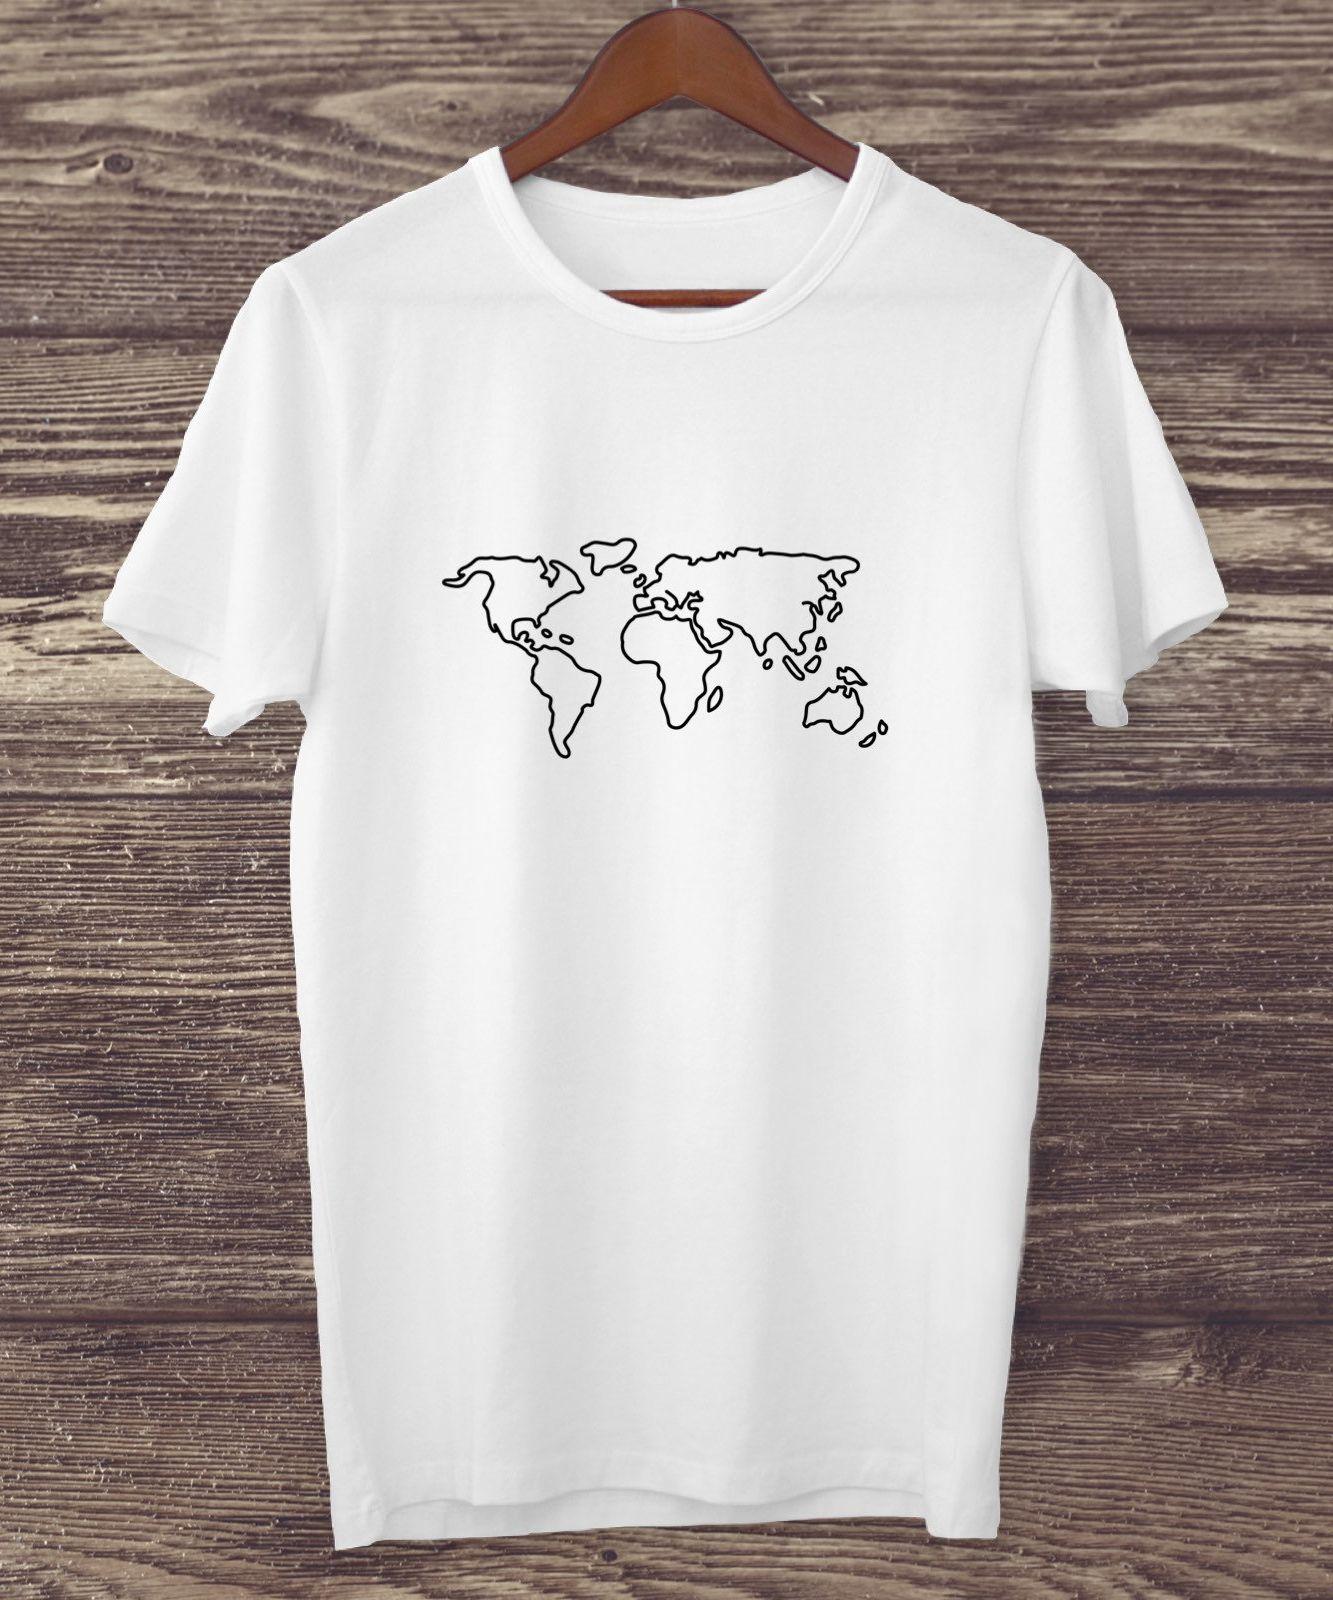 Minimalist World Map Line Art Graphic Tees For Women Tee Shirts Ladies Clothing Trendy Shirt Unisex Oversized Fit Tshirt Tumblr Aesthetic #teedesign